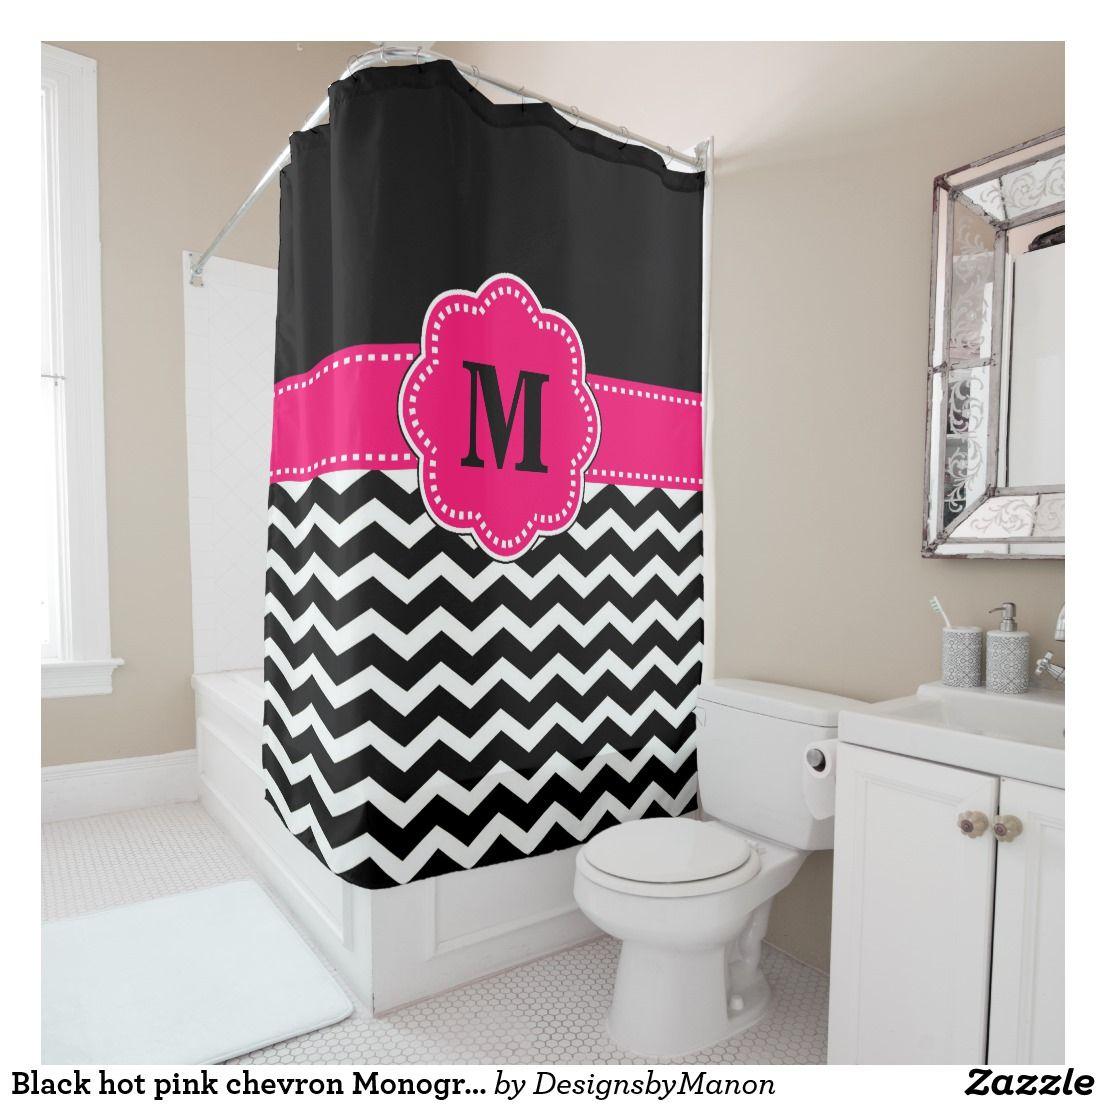 Black Hot Pink Chevron Monogram Shower Curtain Zazzle Com Shower Curtain Monogram Pink Chevron Custom Shower Curtains